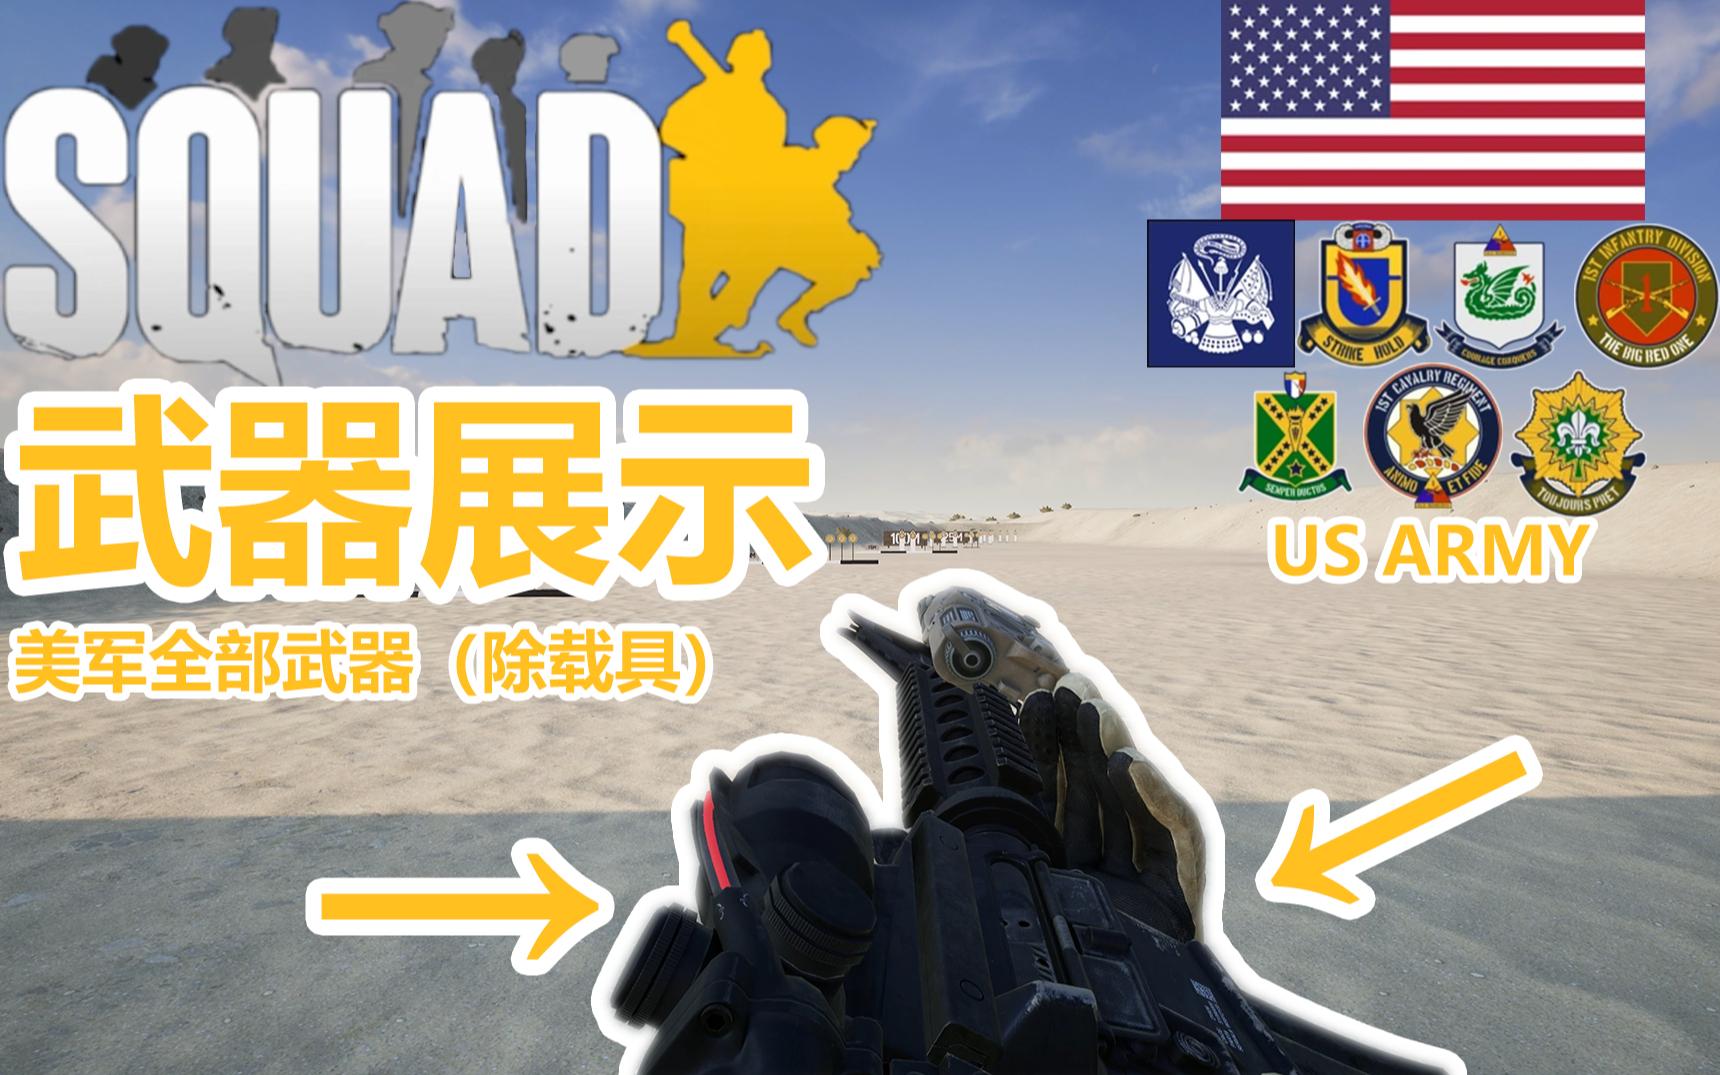 Squad战术小队美国陆军武器展示 版本:V2.5